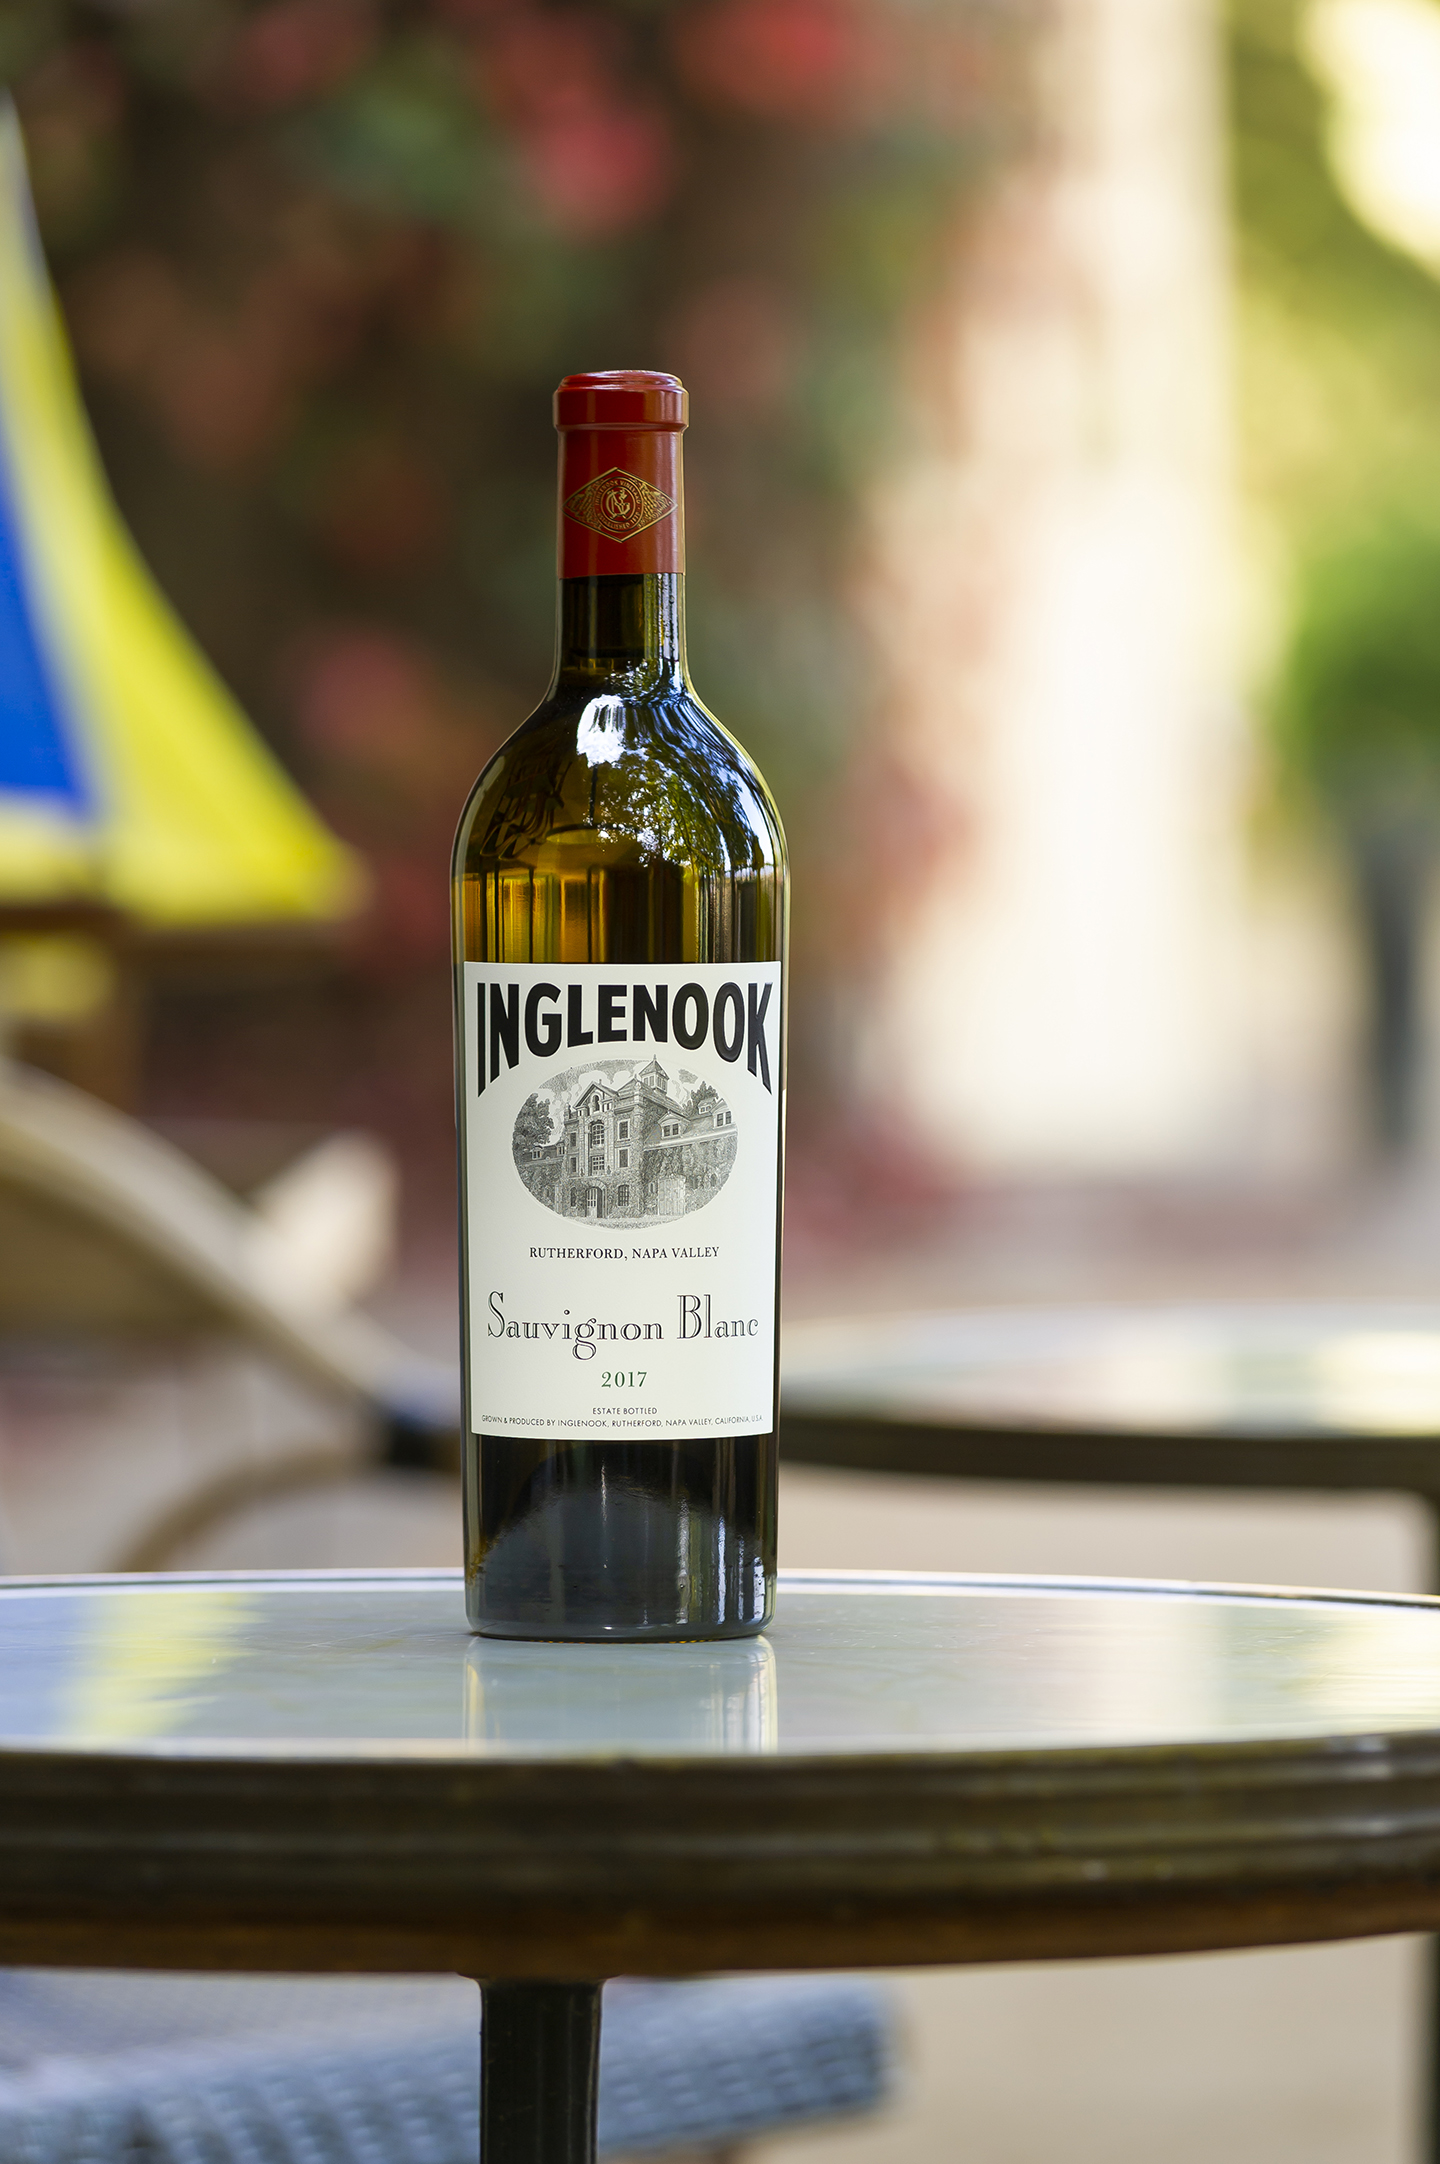 Bottle of Sauvignon Blanc on a bistro table.